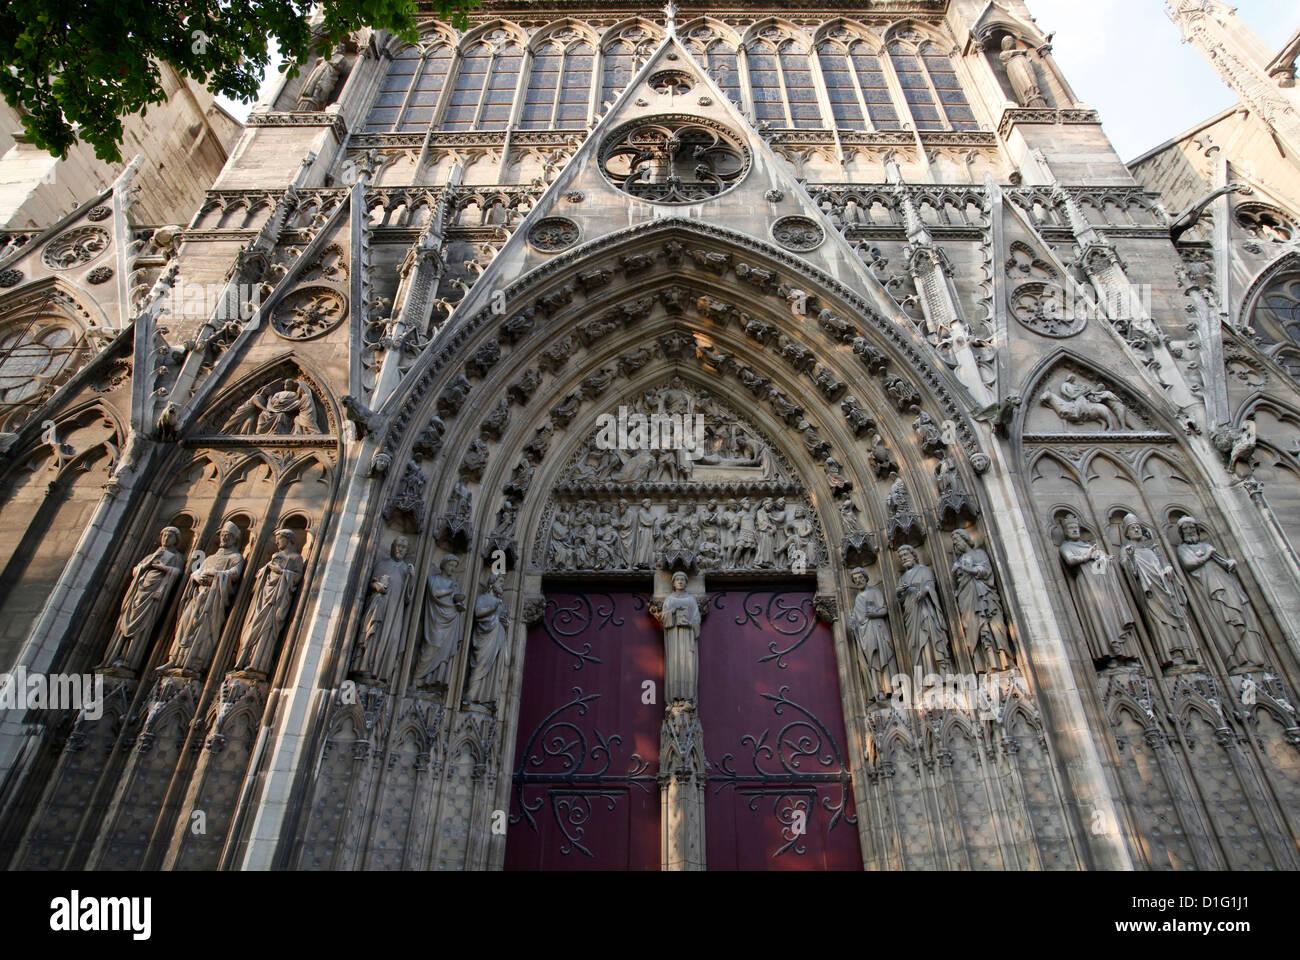 Saint-Etienne's gate, South facade, Notre Dame Cathedral, Paris, France, Europe - Stock Image